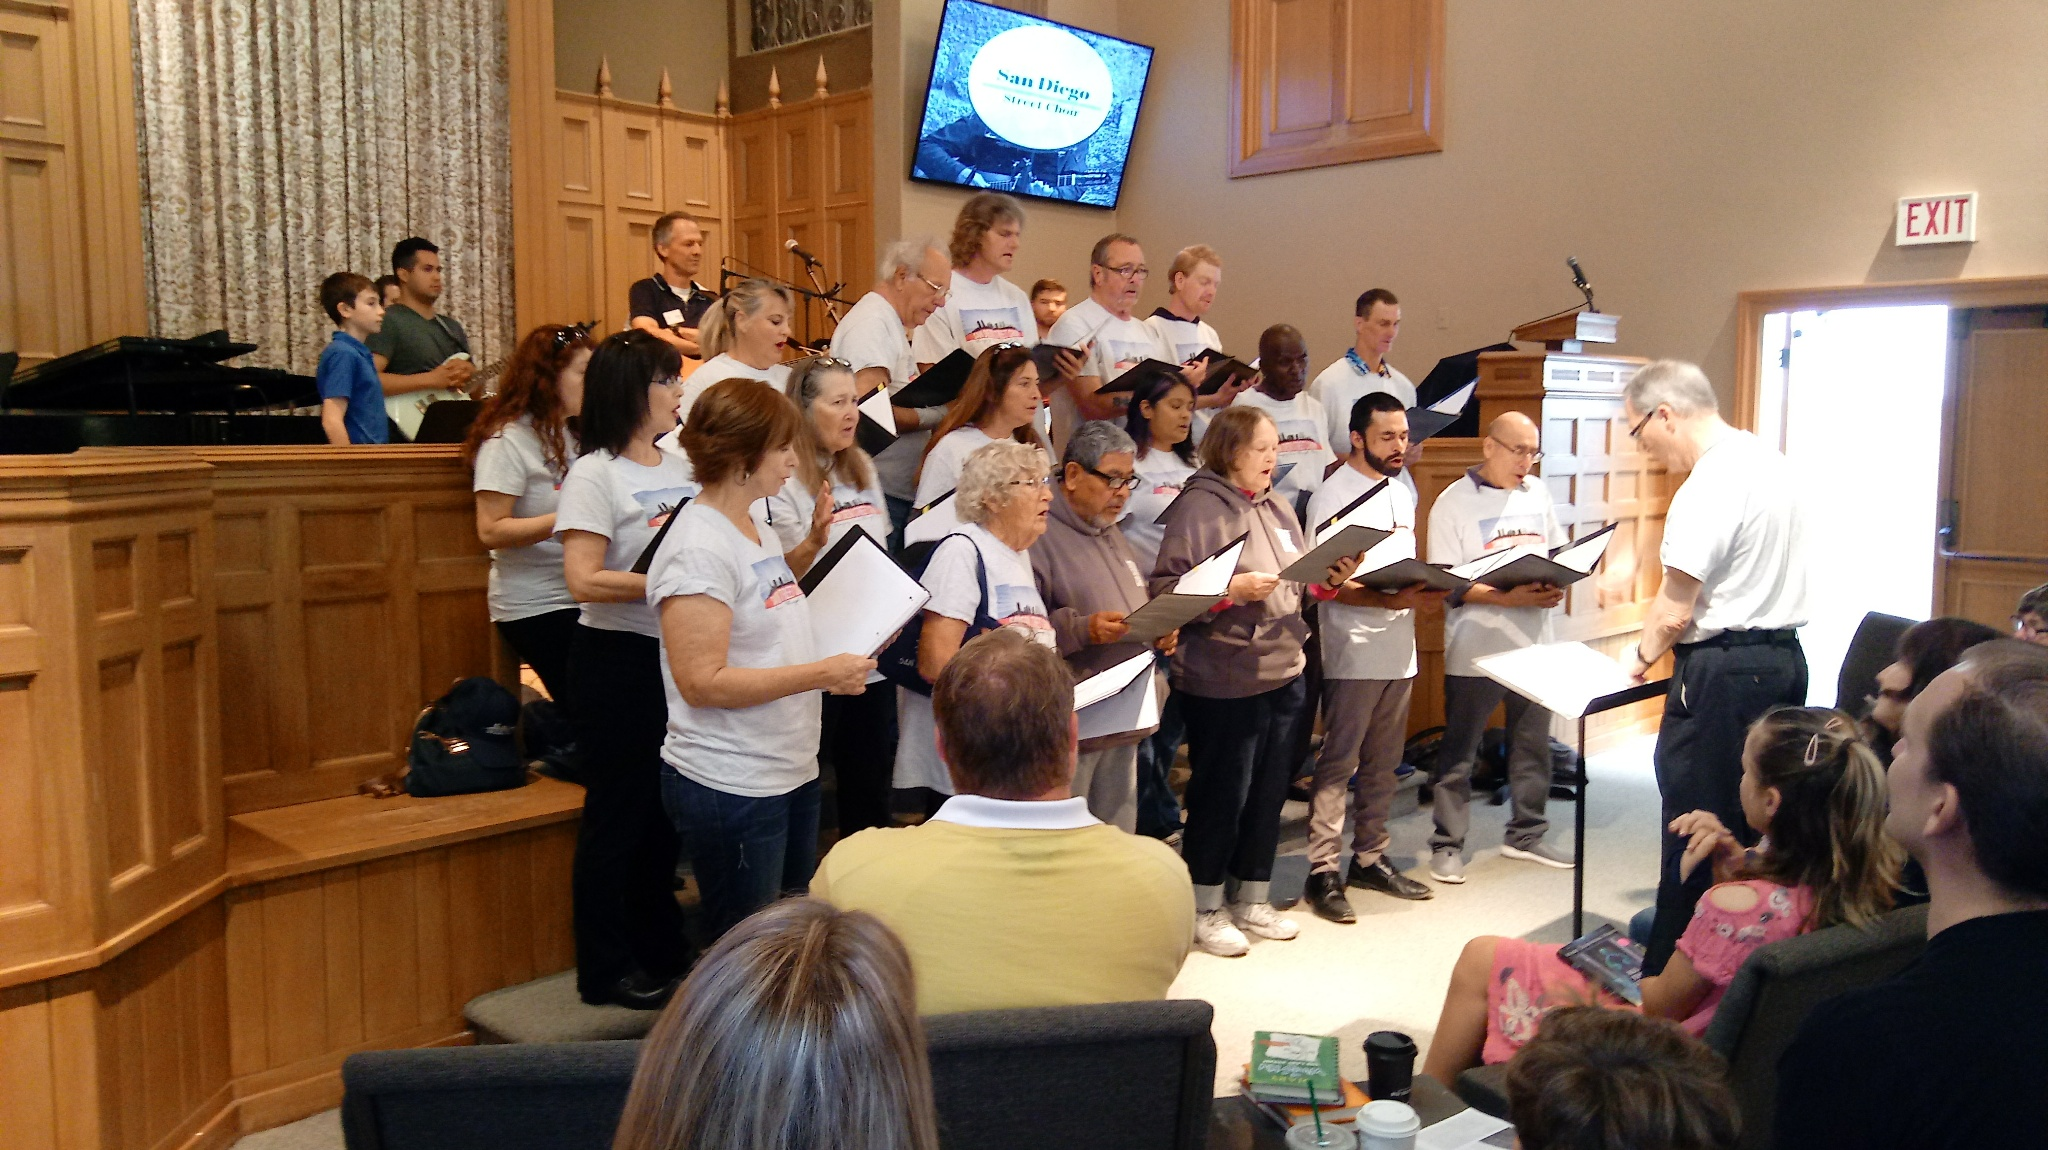 The San Diego Street Choir sings at Point Loma Community Presbyterian Church services.